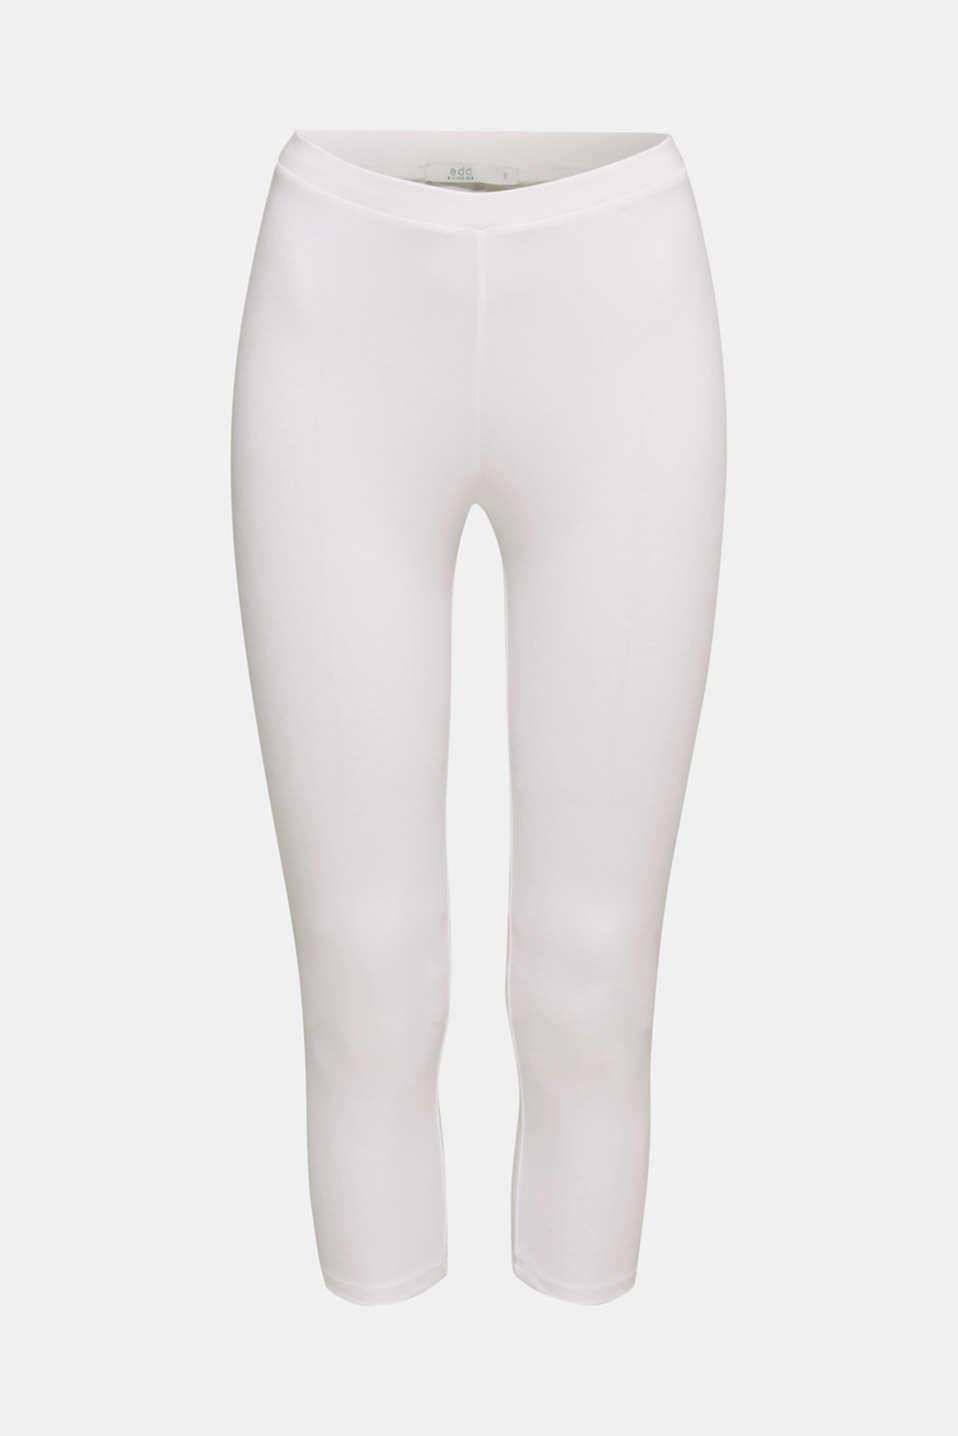 Stretch cotton Capri leggings, WHITE, detail image number 6